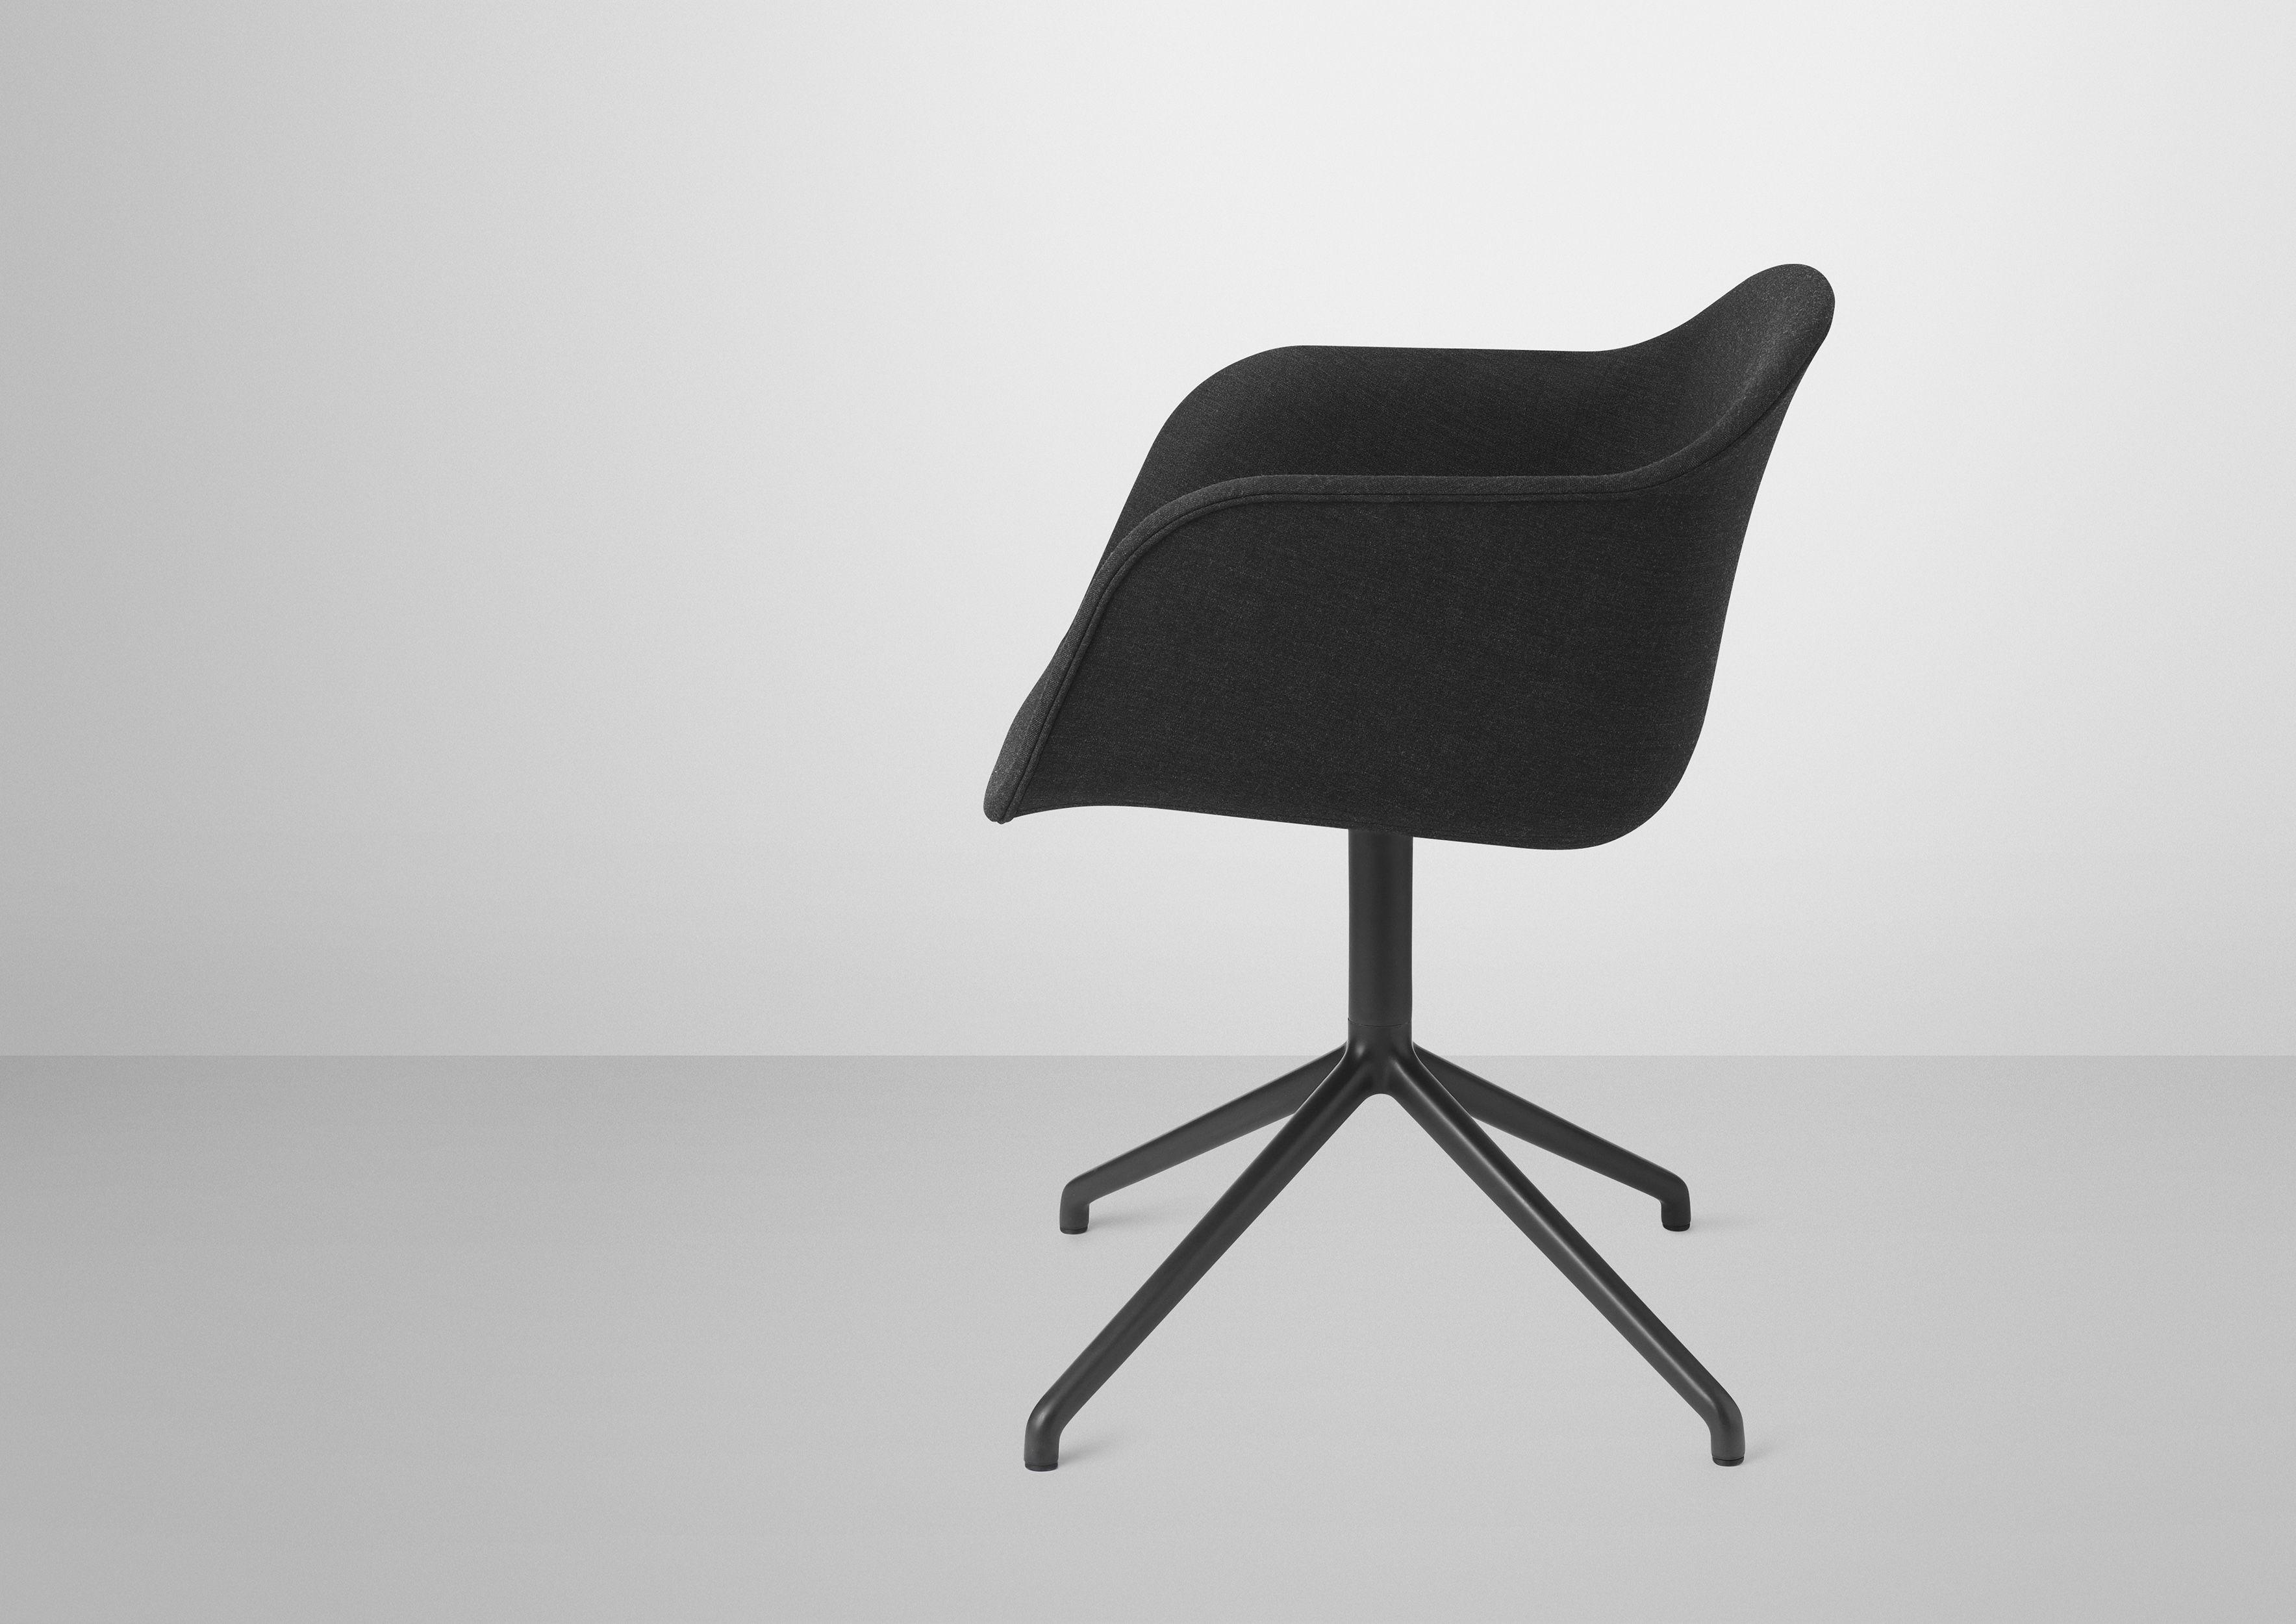 Drehsessel stoff  Fiber / Drehstuhl - Stoff | Muuto | Sessel